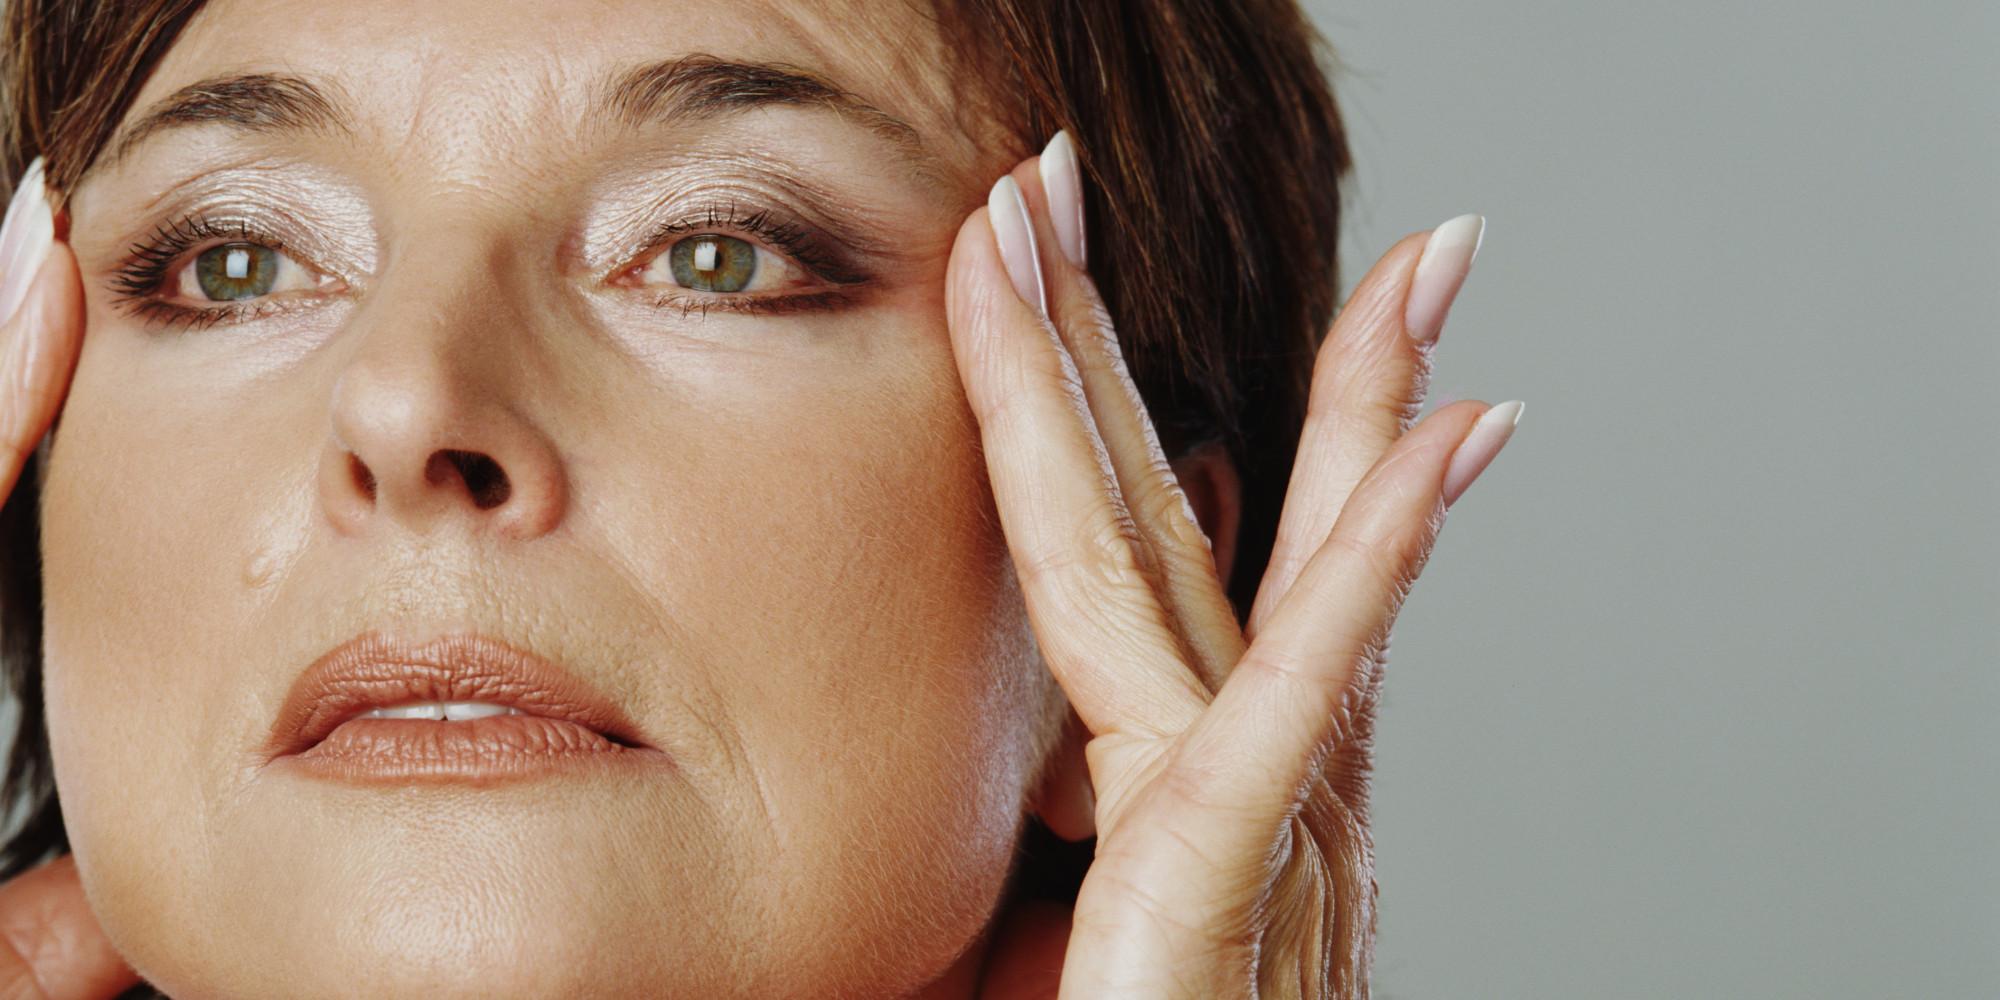 Уход за увядающей кожей лица в домашних условиях рецепты